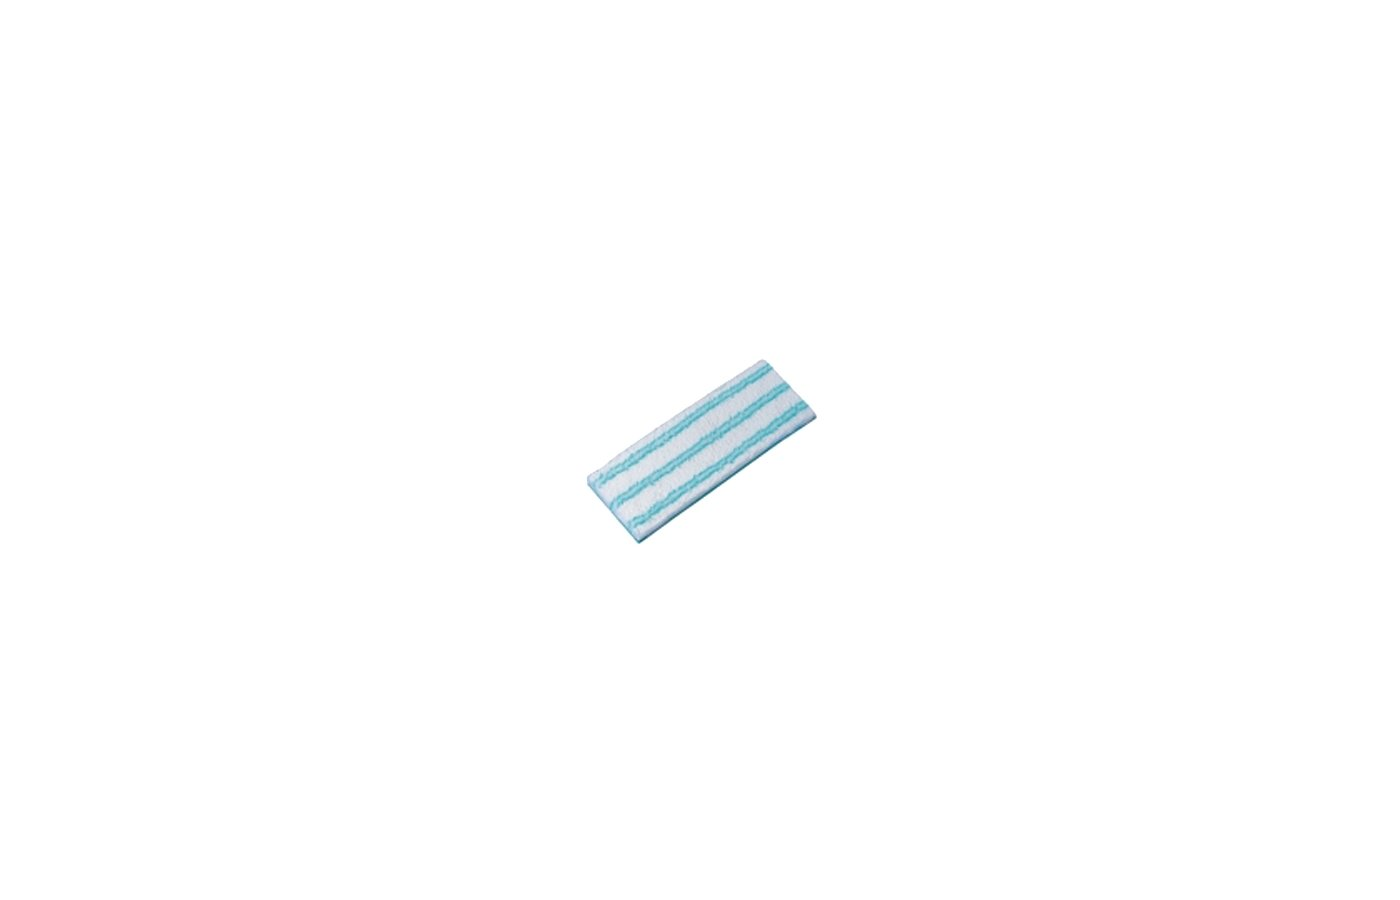 "Инвентарь для уборки LEIFHEIT Убор PICOBELLO Зап.насадка ""M""(micro duo)56610"